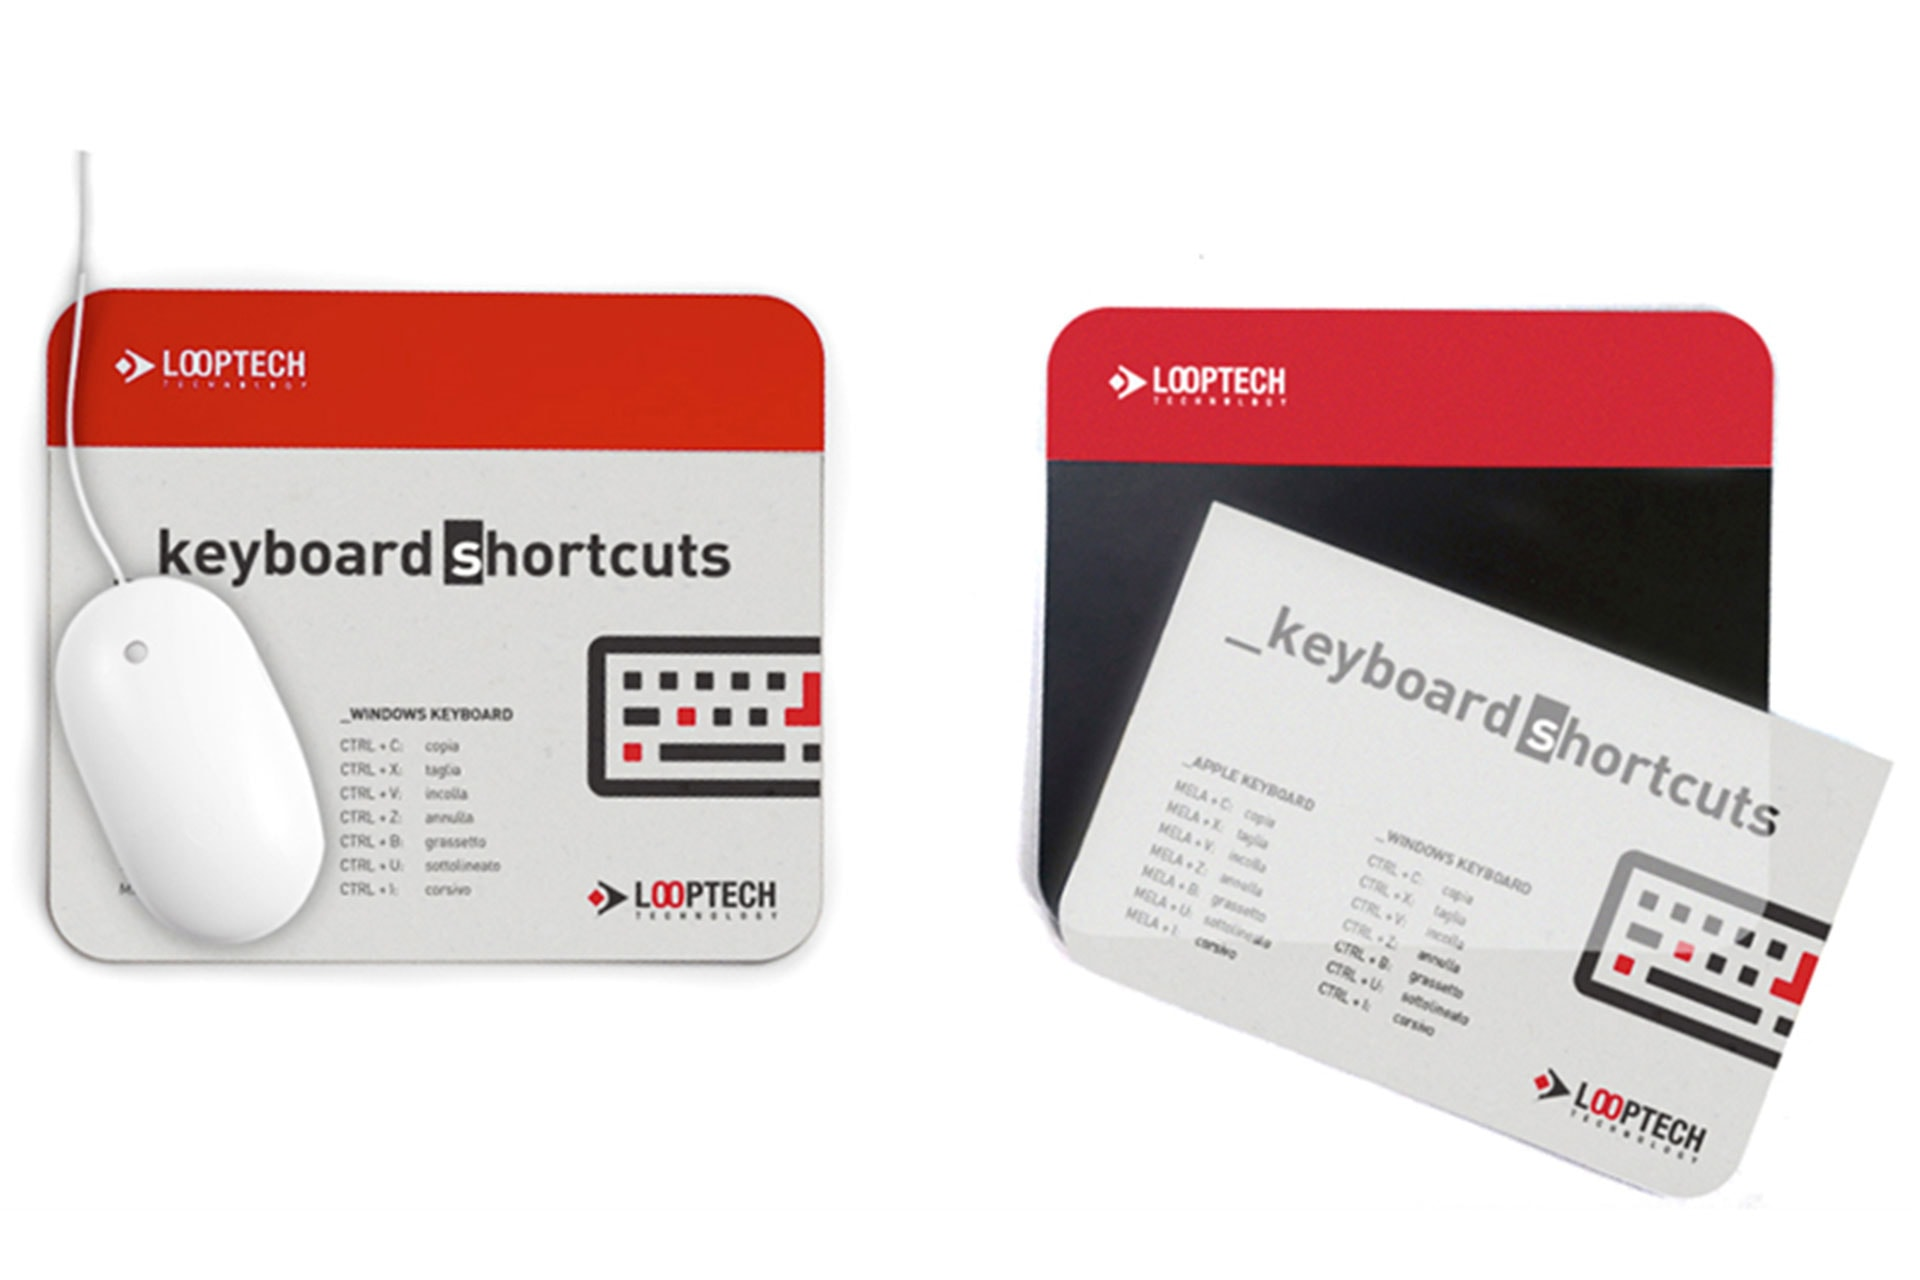 Mouse pad portadocumenti, notes, appunti, schemi tecnici